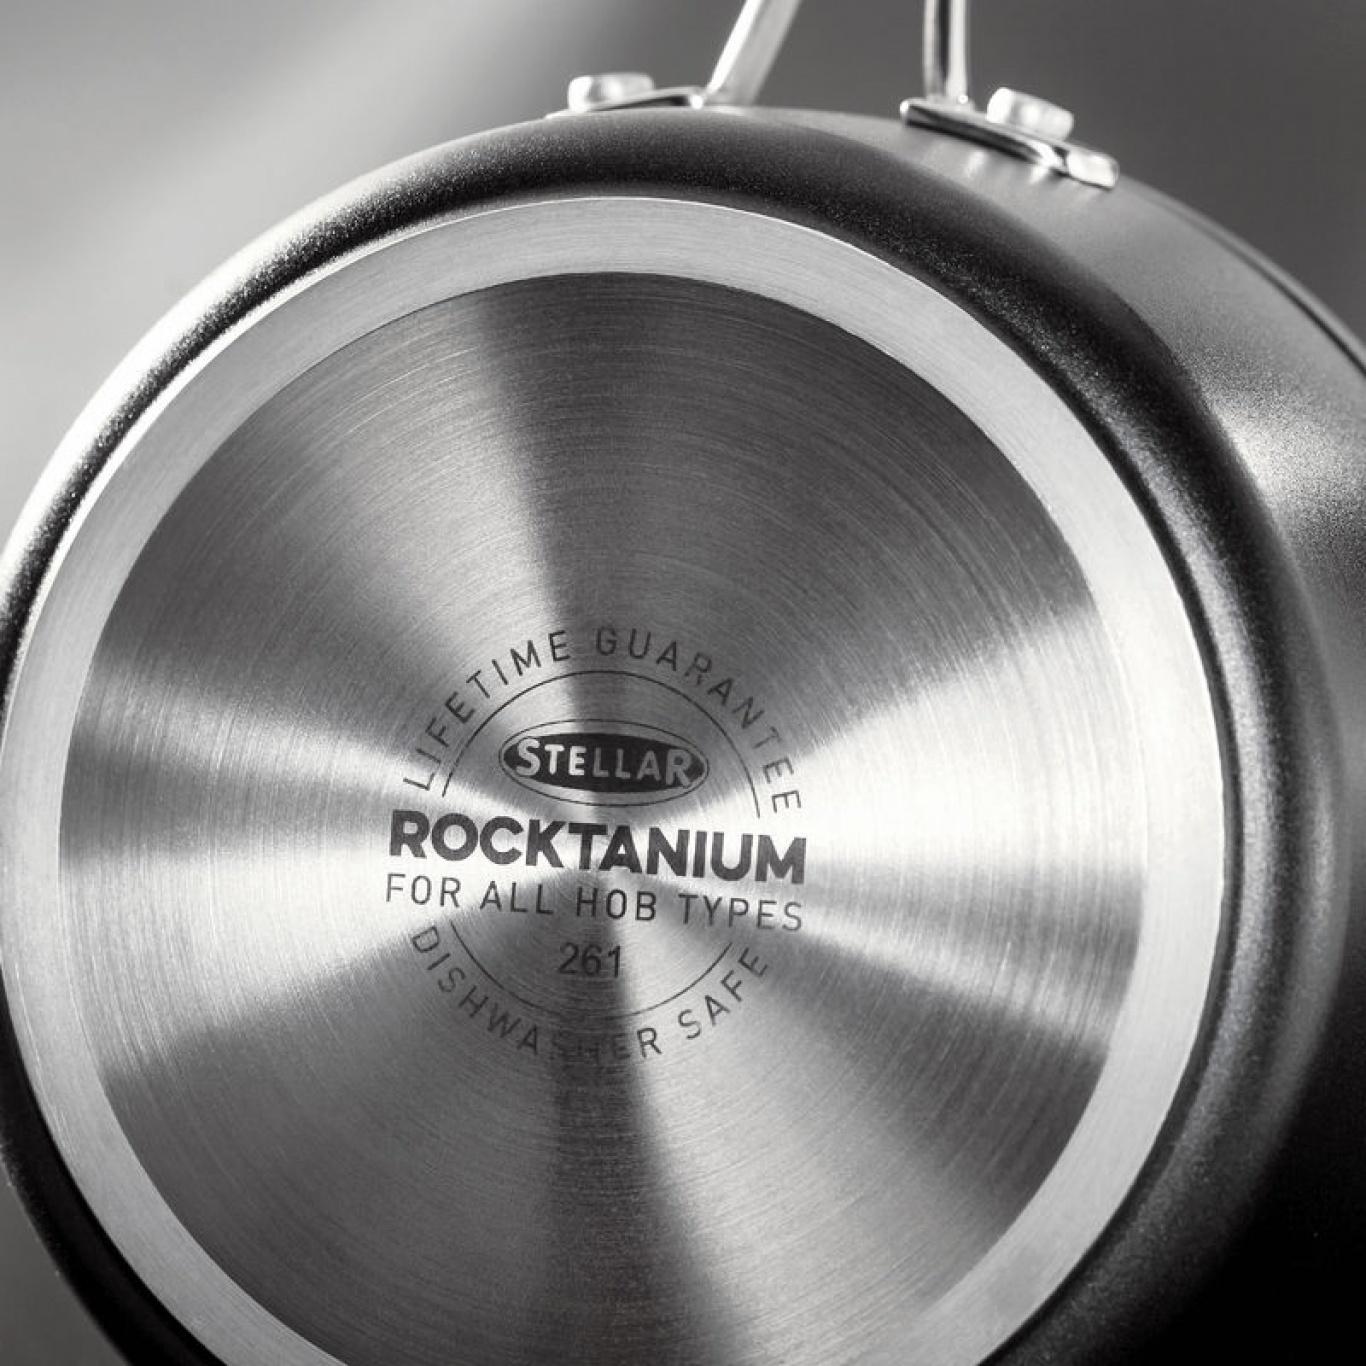 Stellar Rocktanium 5 pce Saucepan Set